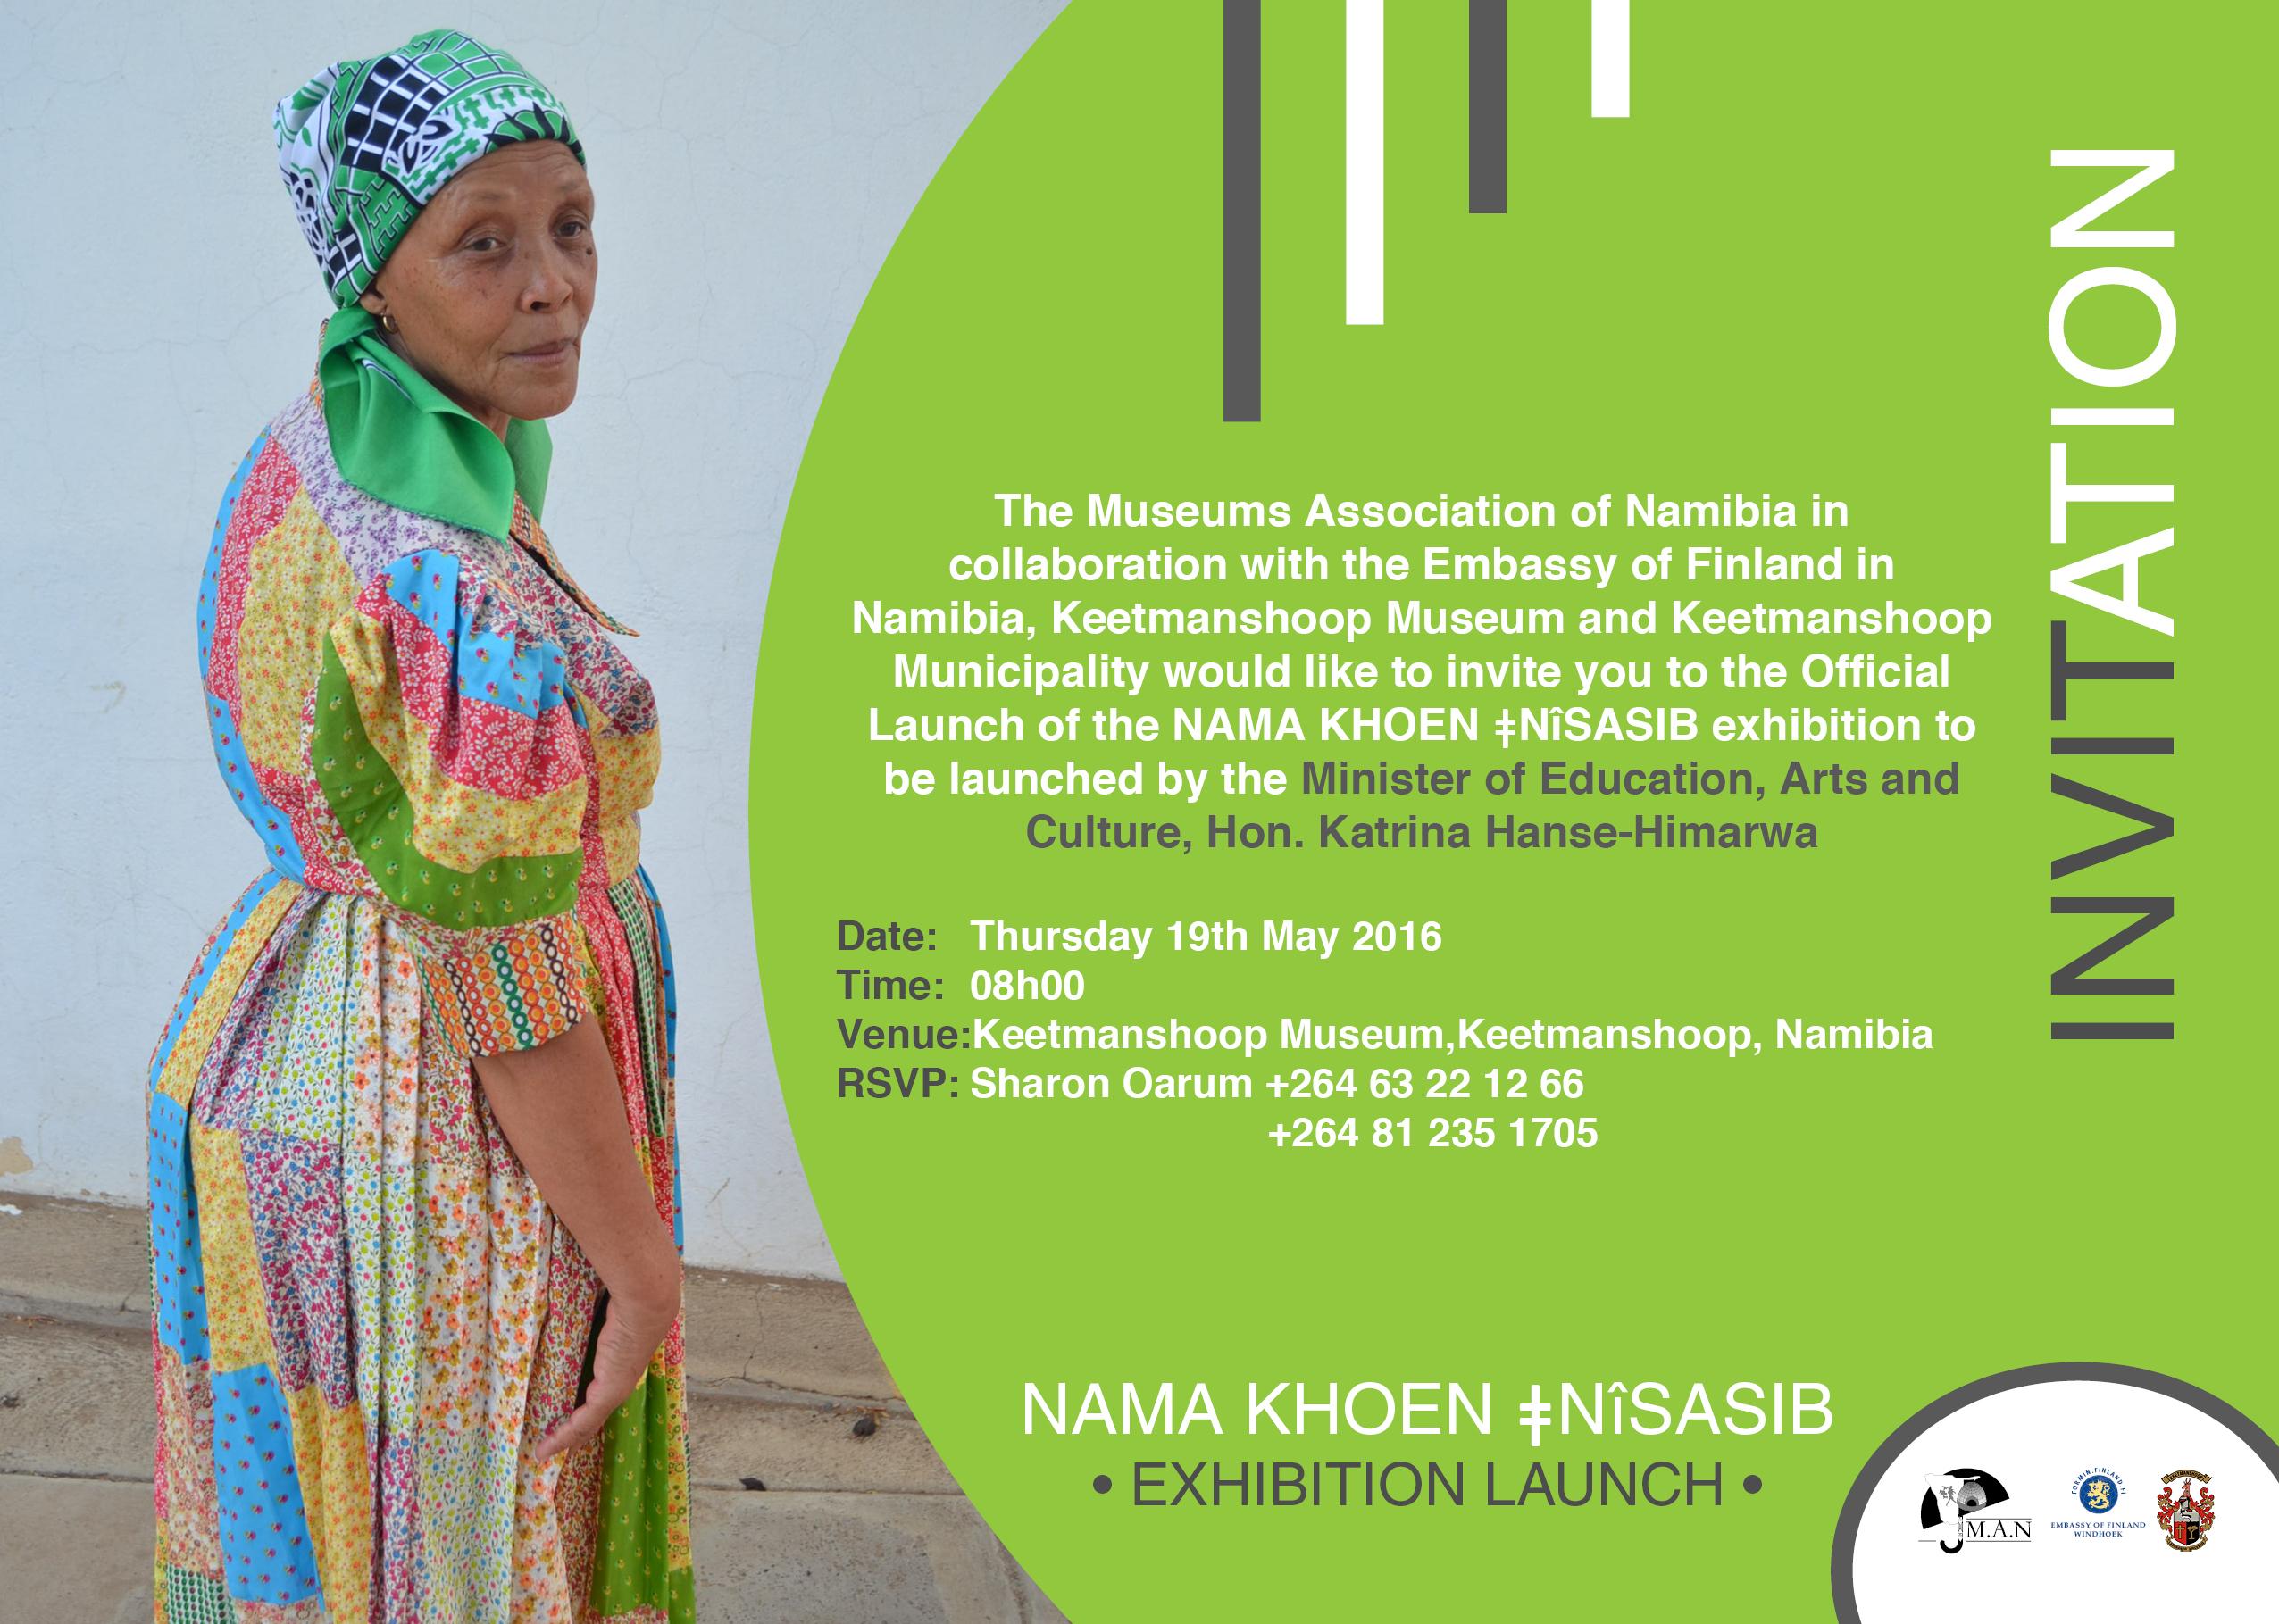 Invitation nama khoen nsasib exhibition official launch date thursday 19th may 2016 time 08h00 venue keetmanshoop museum keetmanshoop namibia rsvp sharon oarum 264 63 22 12 66 264 81 235 1705 stopboris Choice Image